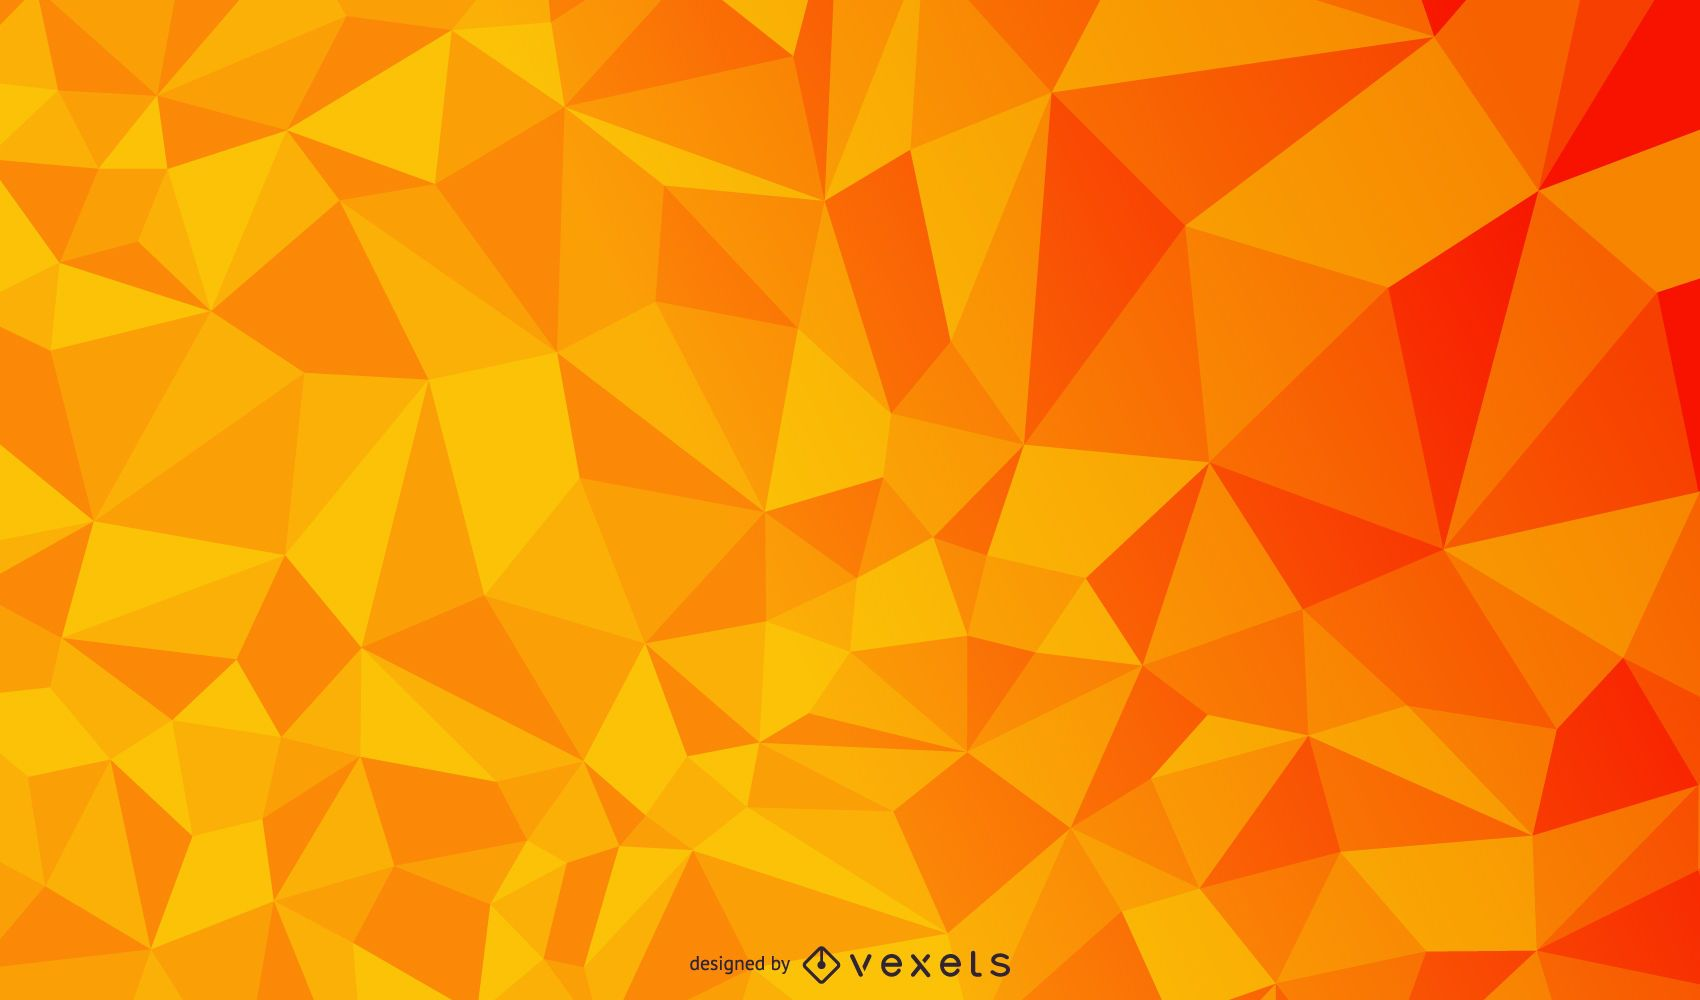 Textura de triángulo poligonal geométrico naranja